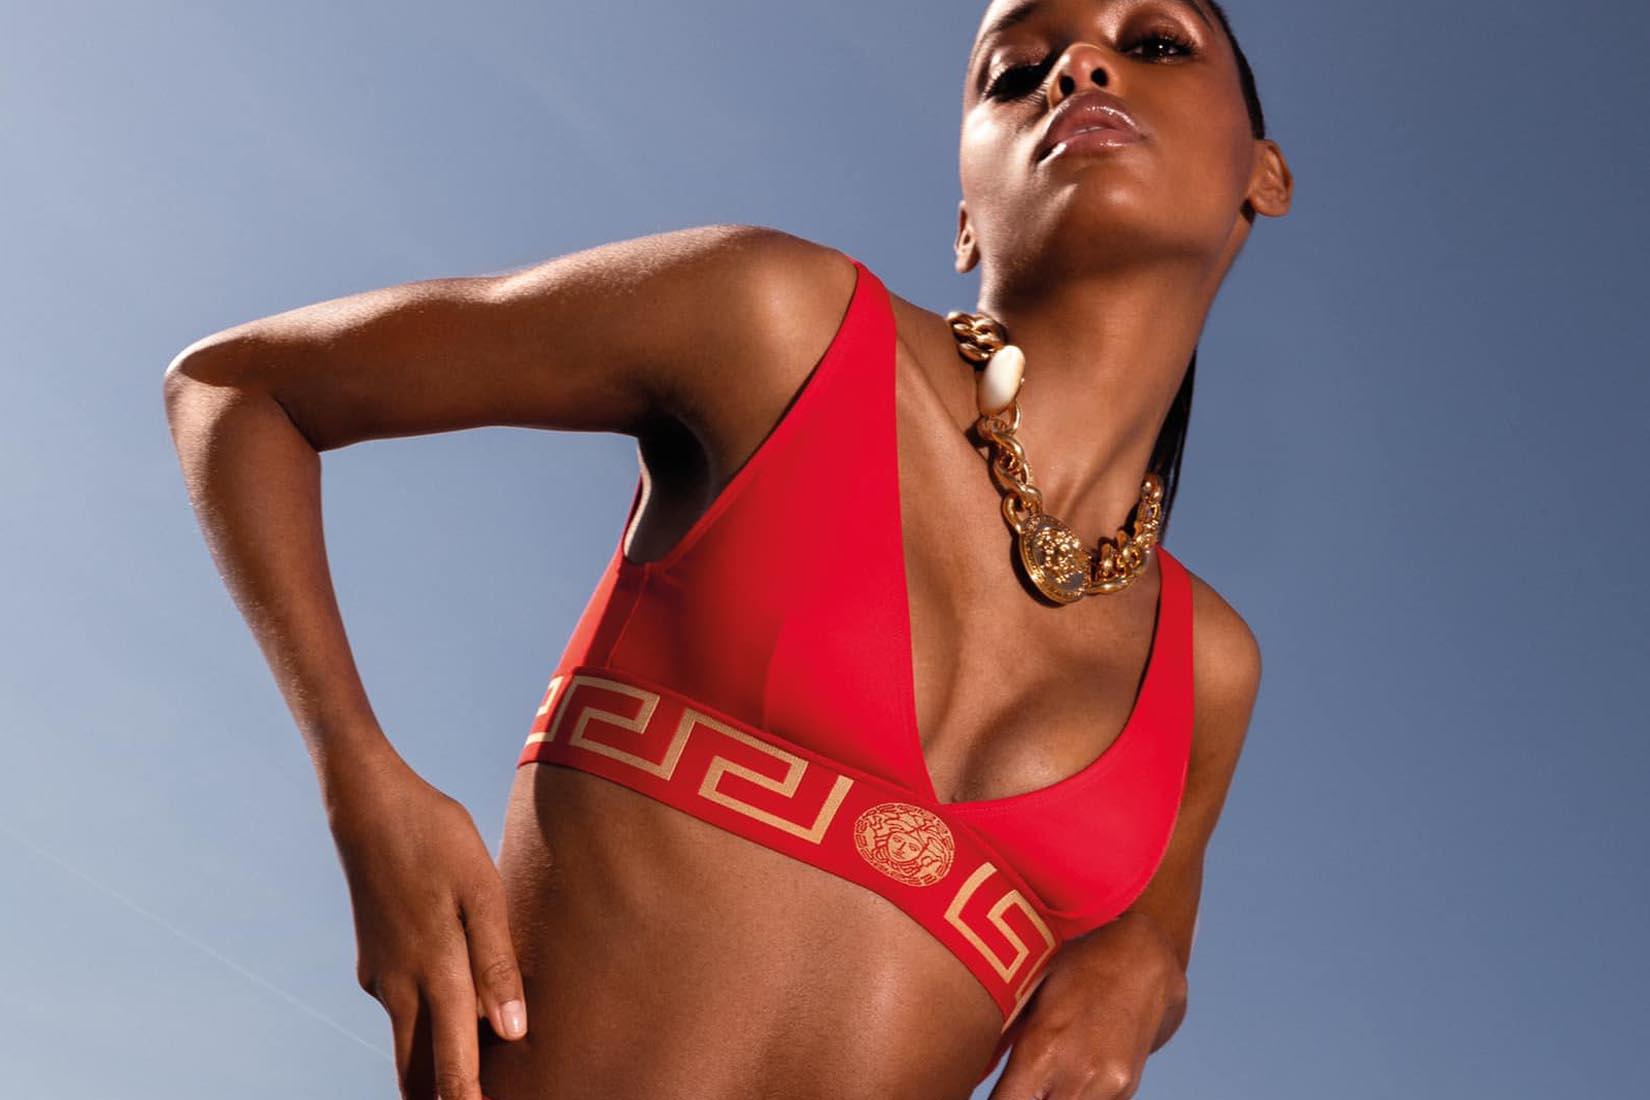 best lingerie brands Versace review Luxe Digital